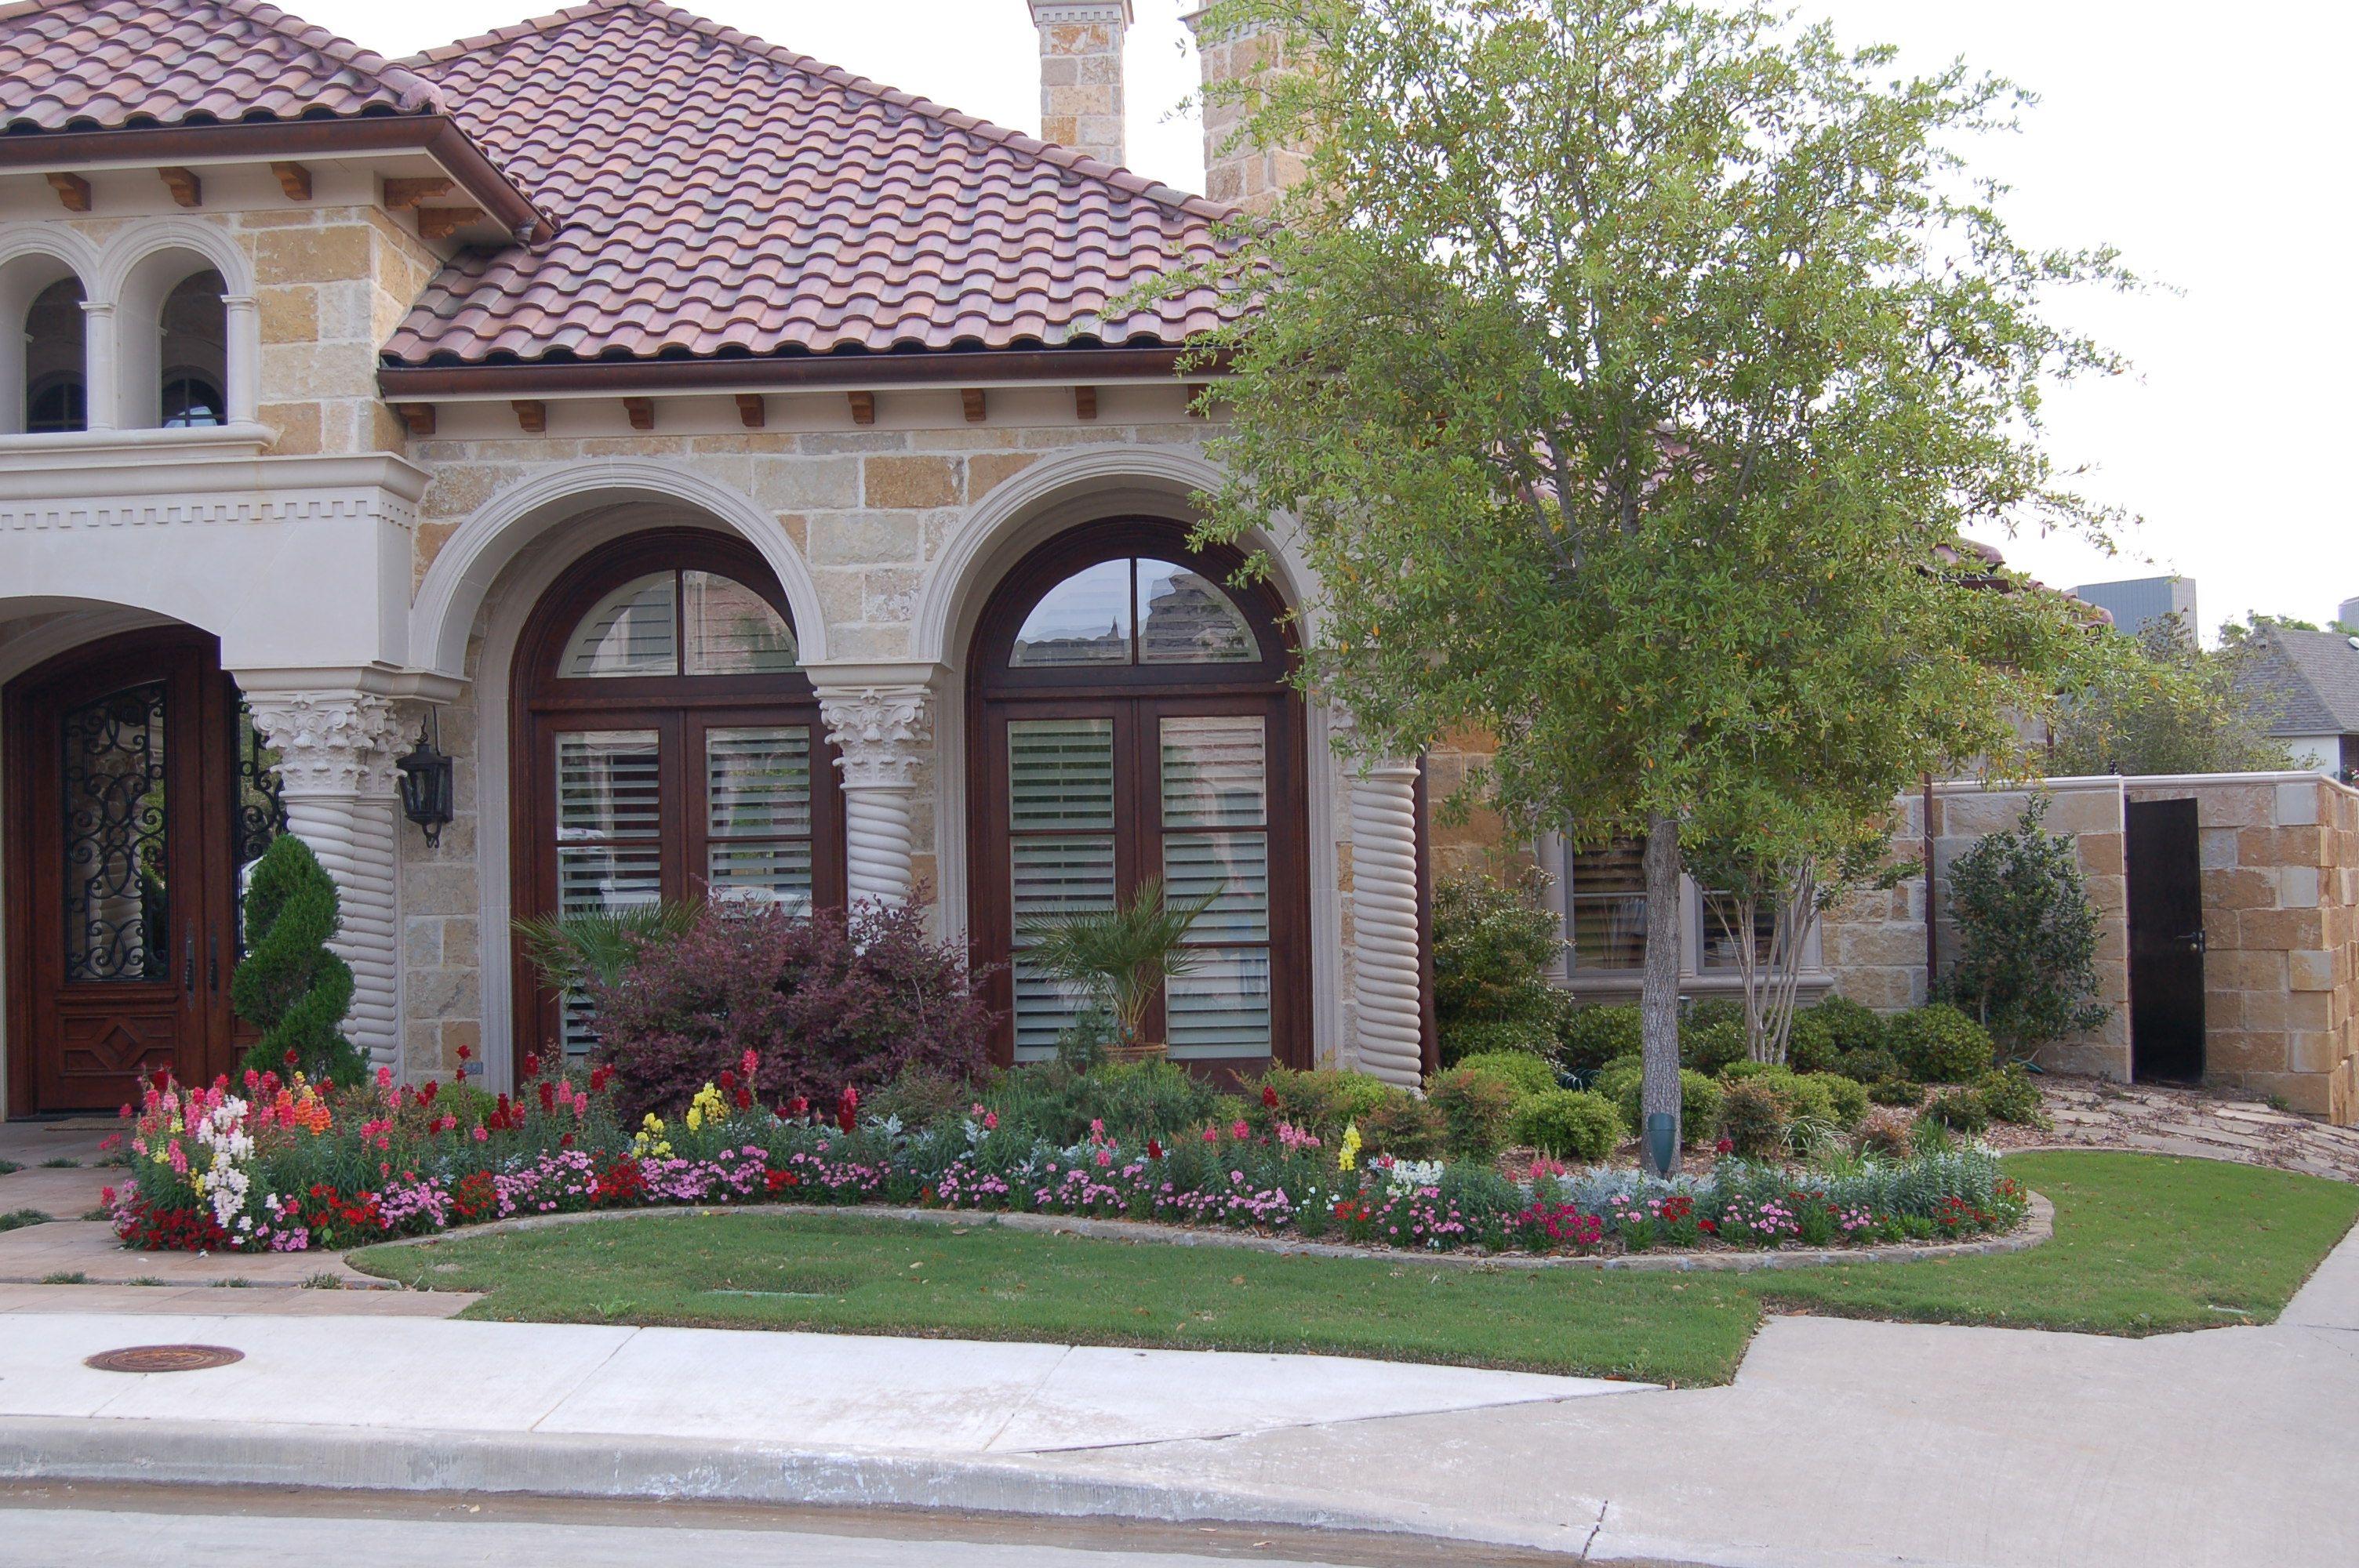 landscaping designs google search - Residential Landscape Design Ideas